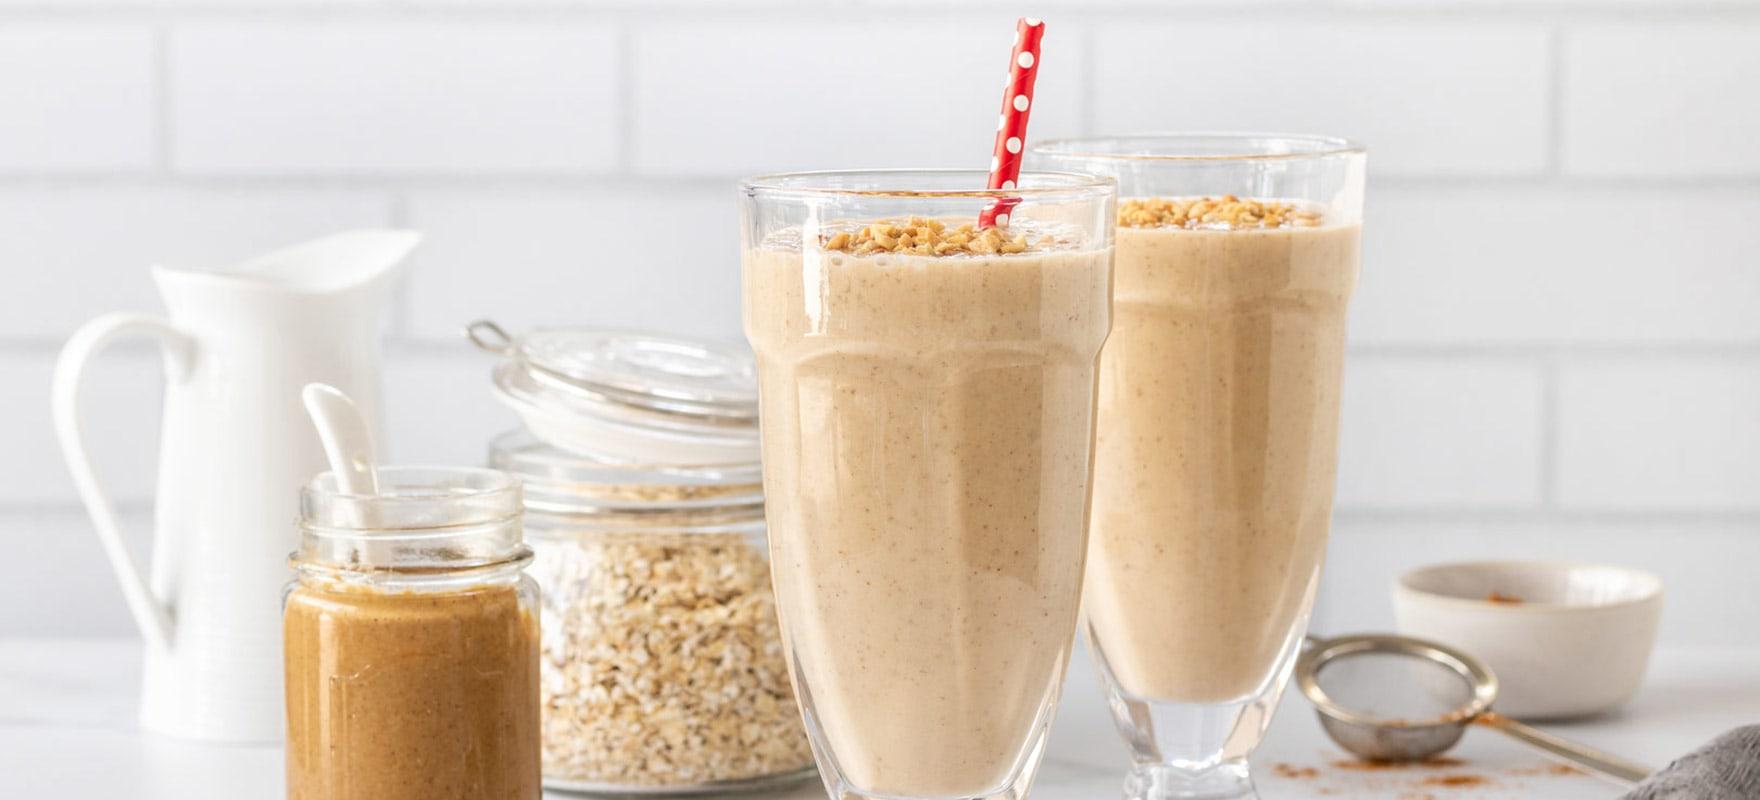 Peanut butter banana protein milkshake image 1